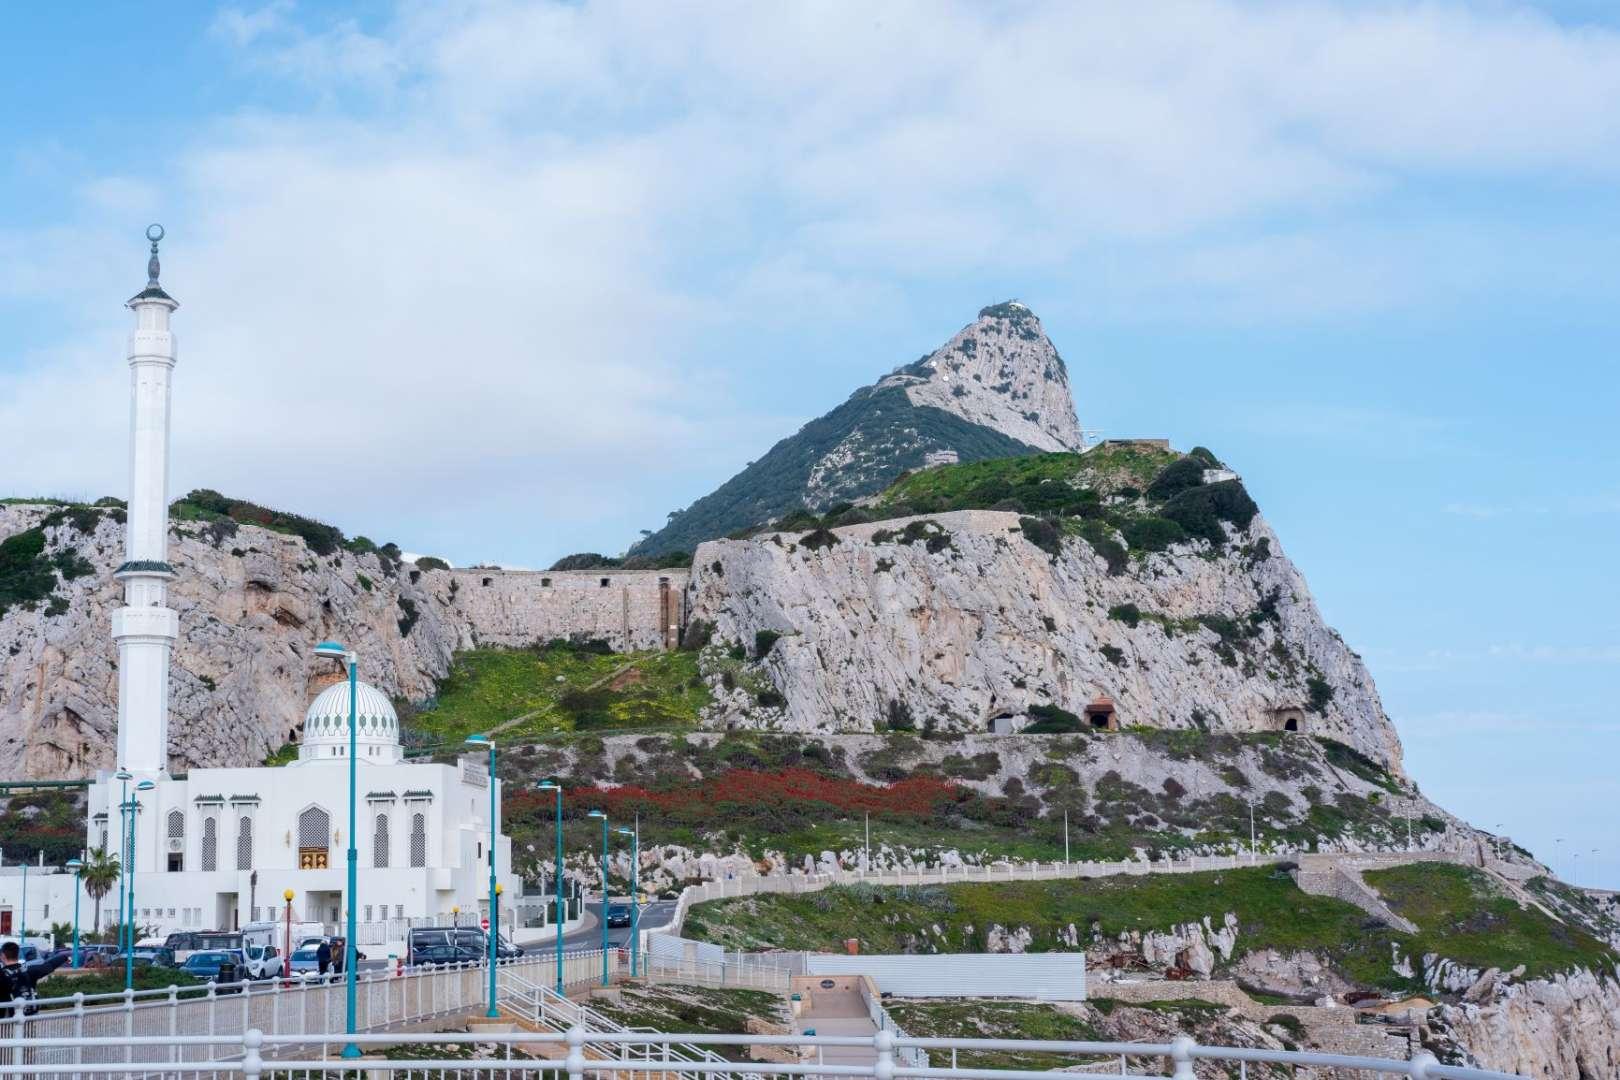 Reasons to Visit Gibraltar - The Rock